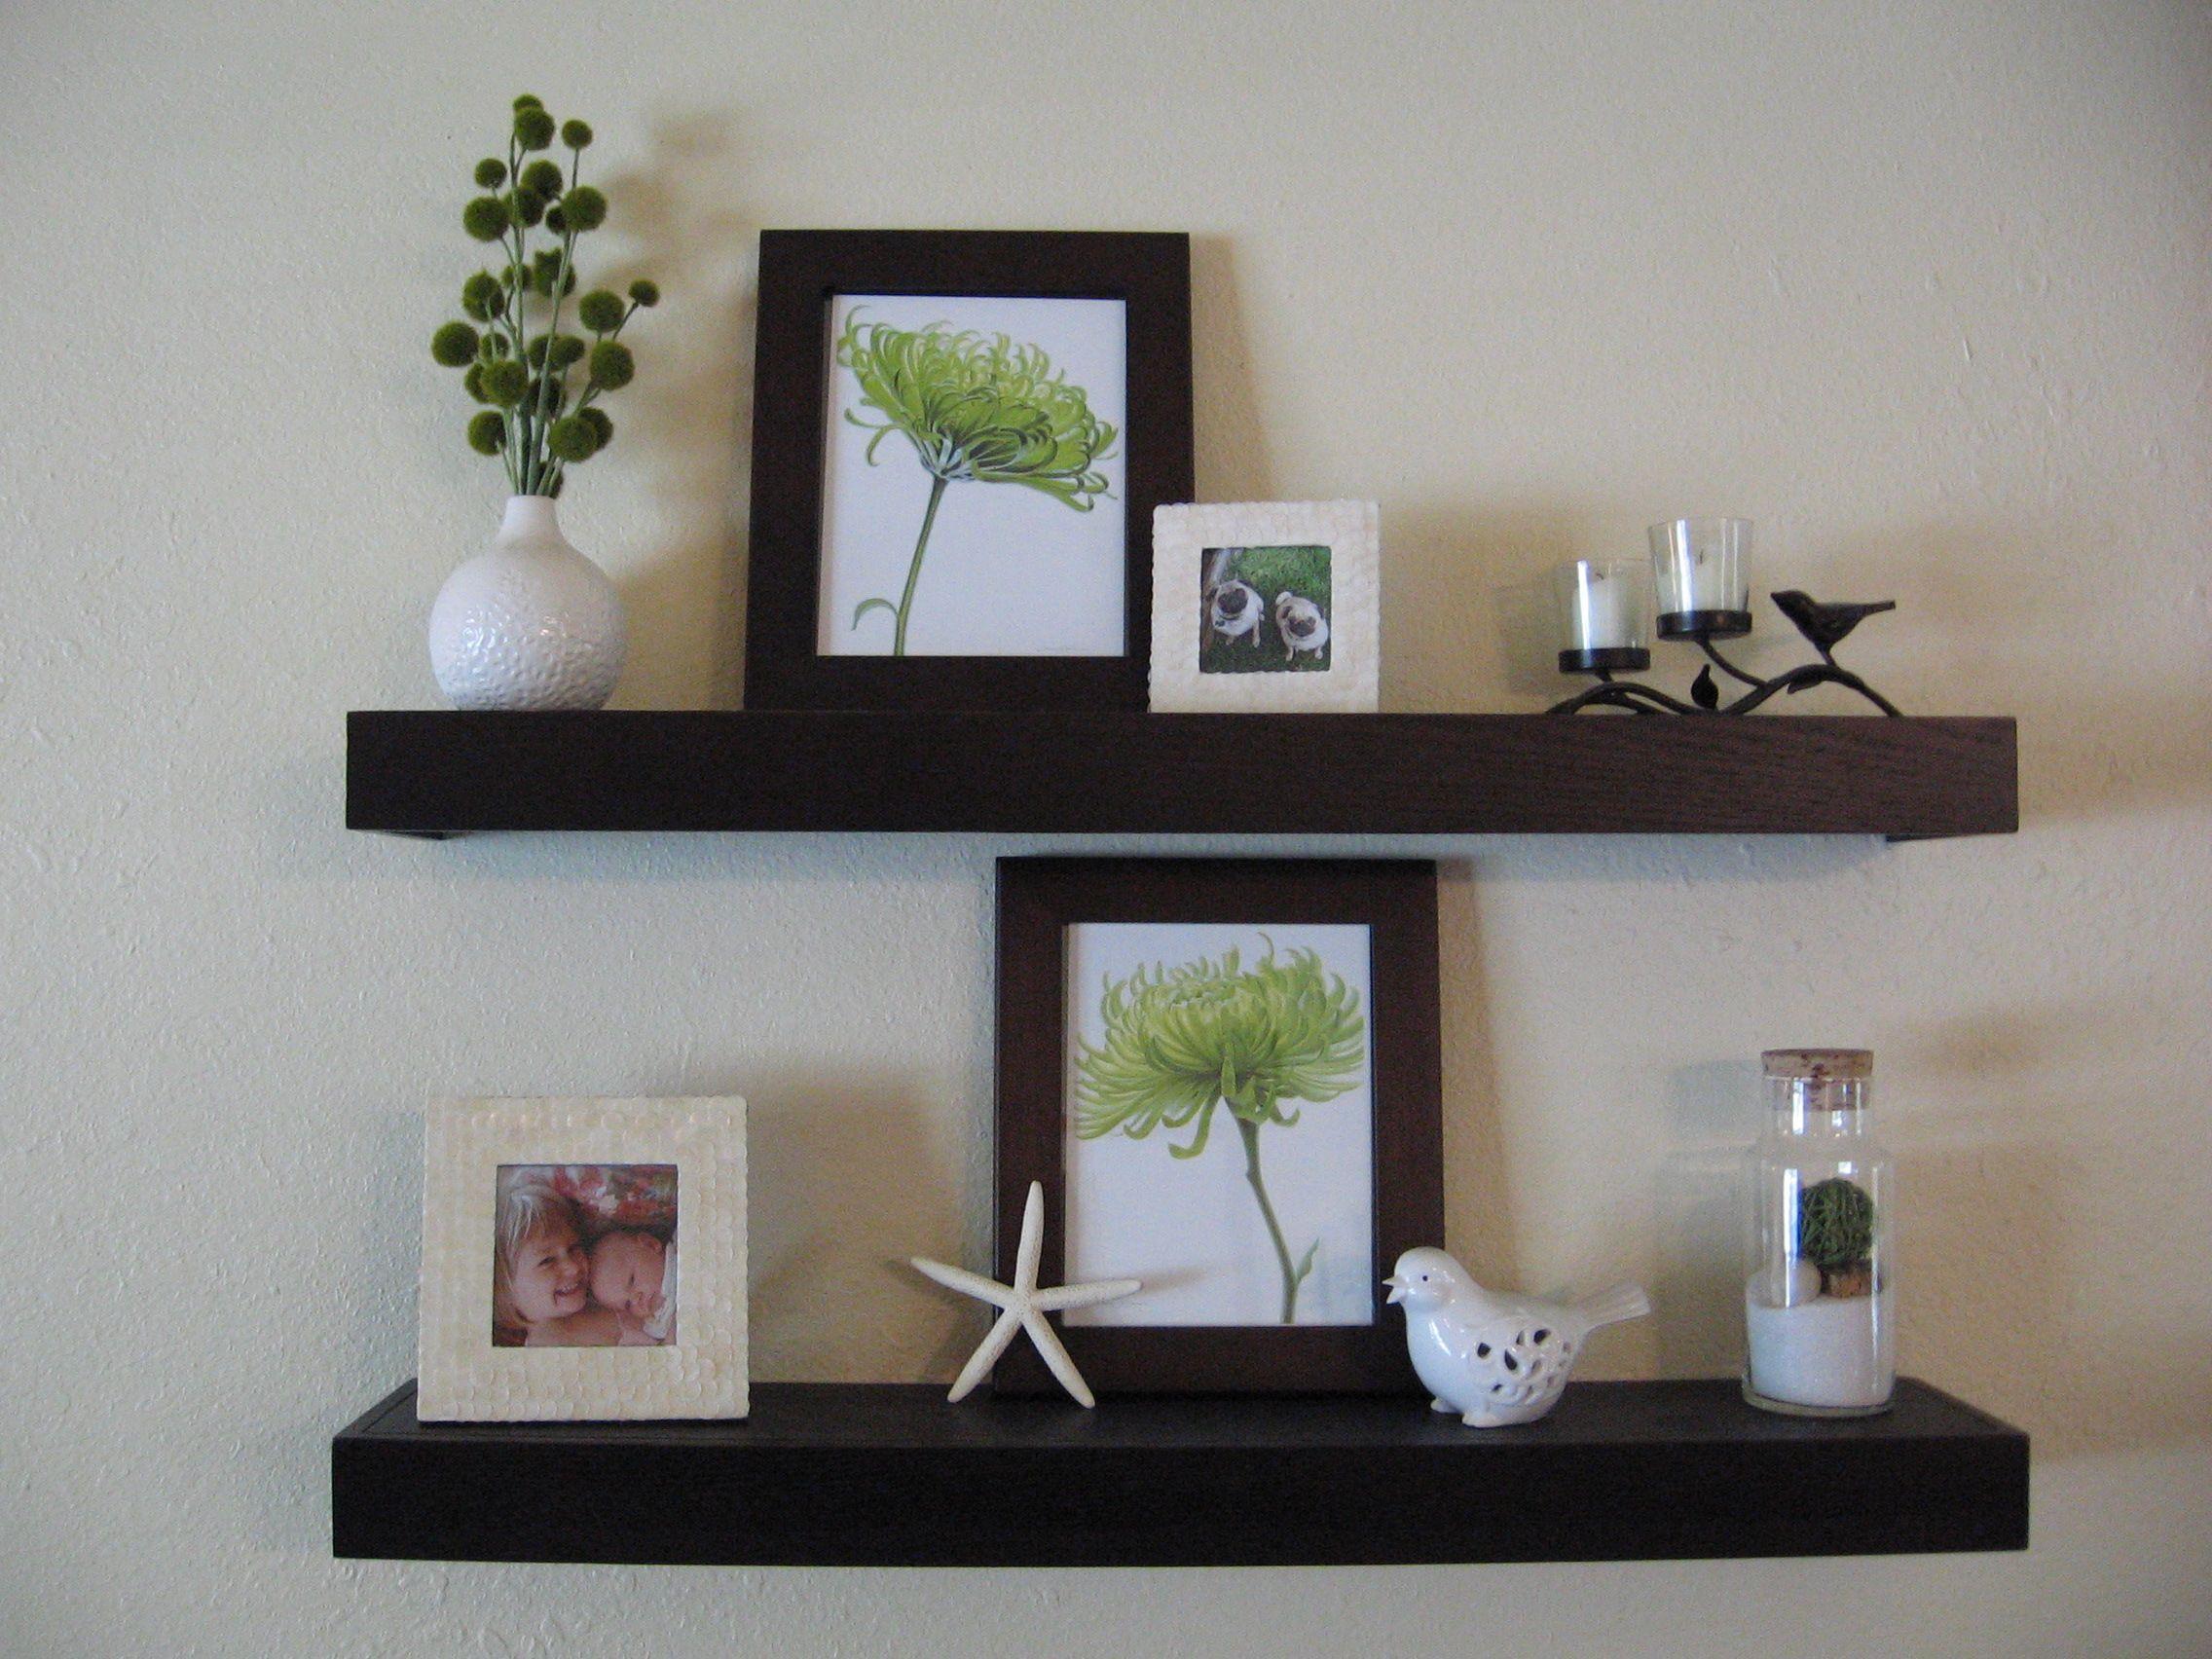 Bookshelf Decorating Ideas Living Room Rustic Bedrooms